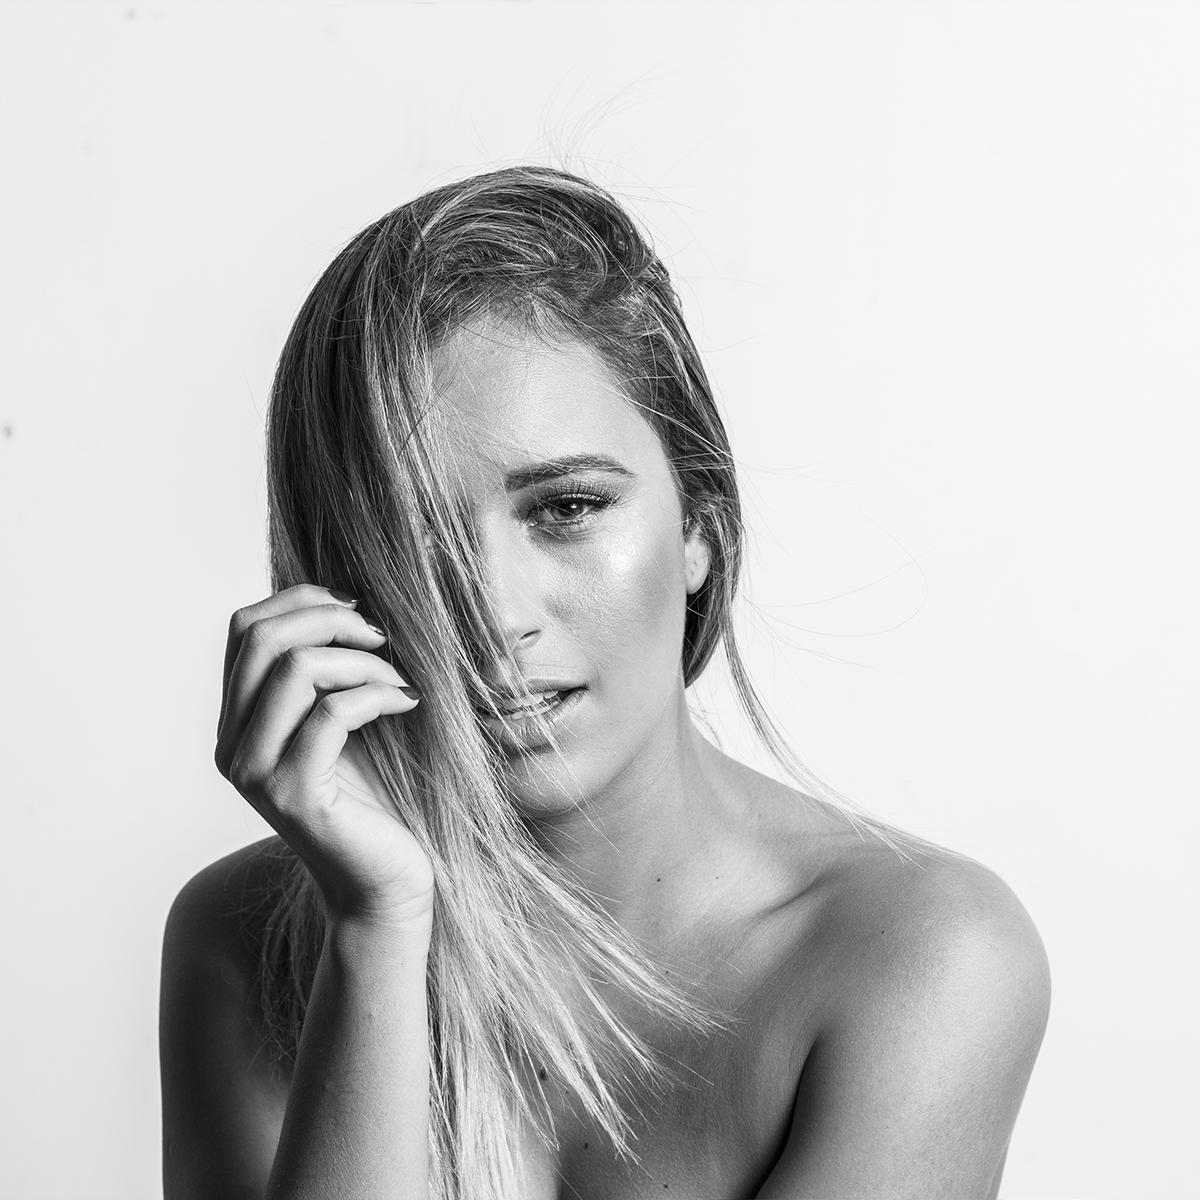 light lightning test hair nude soft clean minimalist Brazilian blonde artistic art pb bw Monochromatic